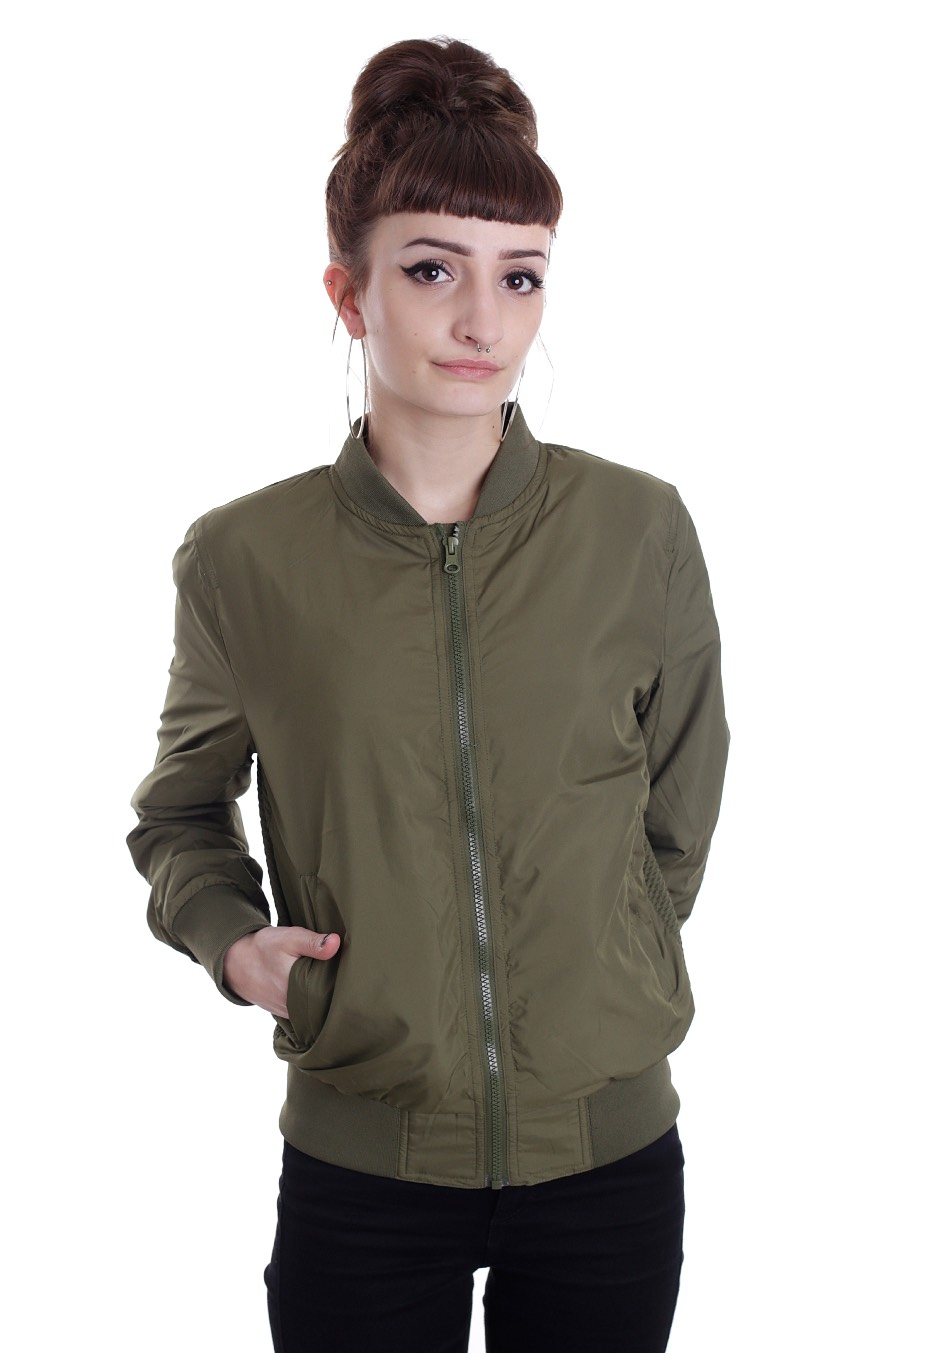 fb758d358c8f2 Urban Classics - Light Bomber Olive - Jacket - Streetwear Shop -  Impericon.com UK